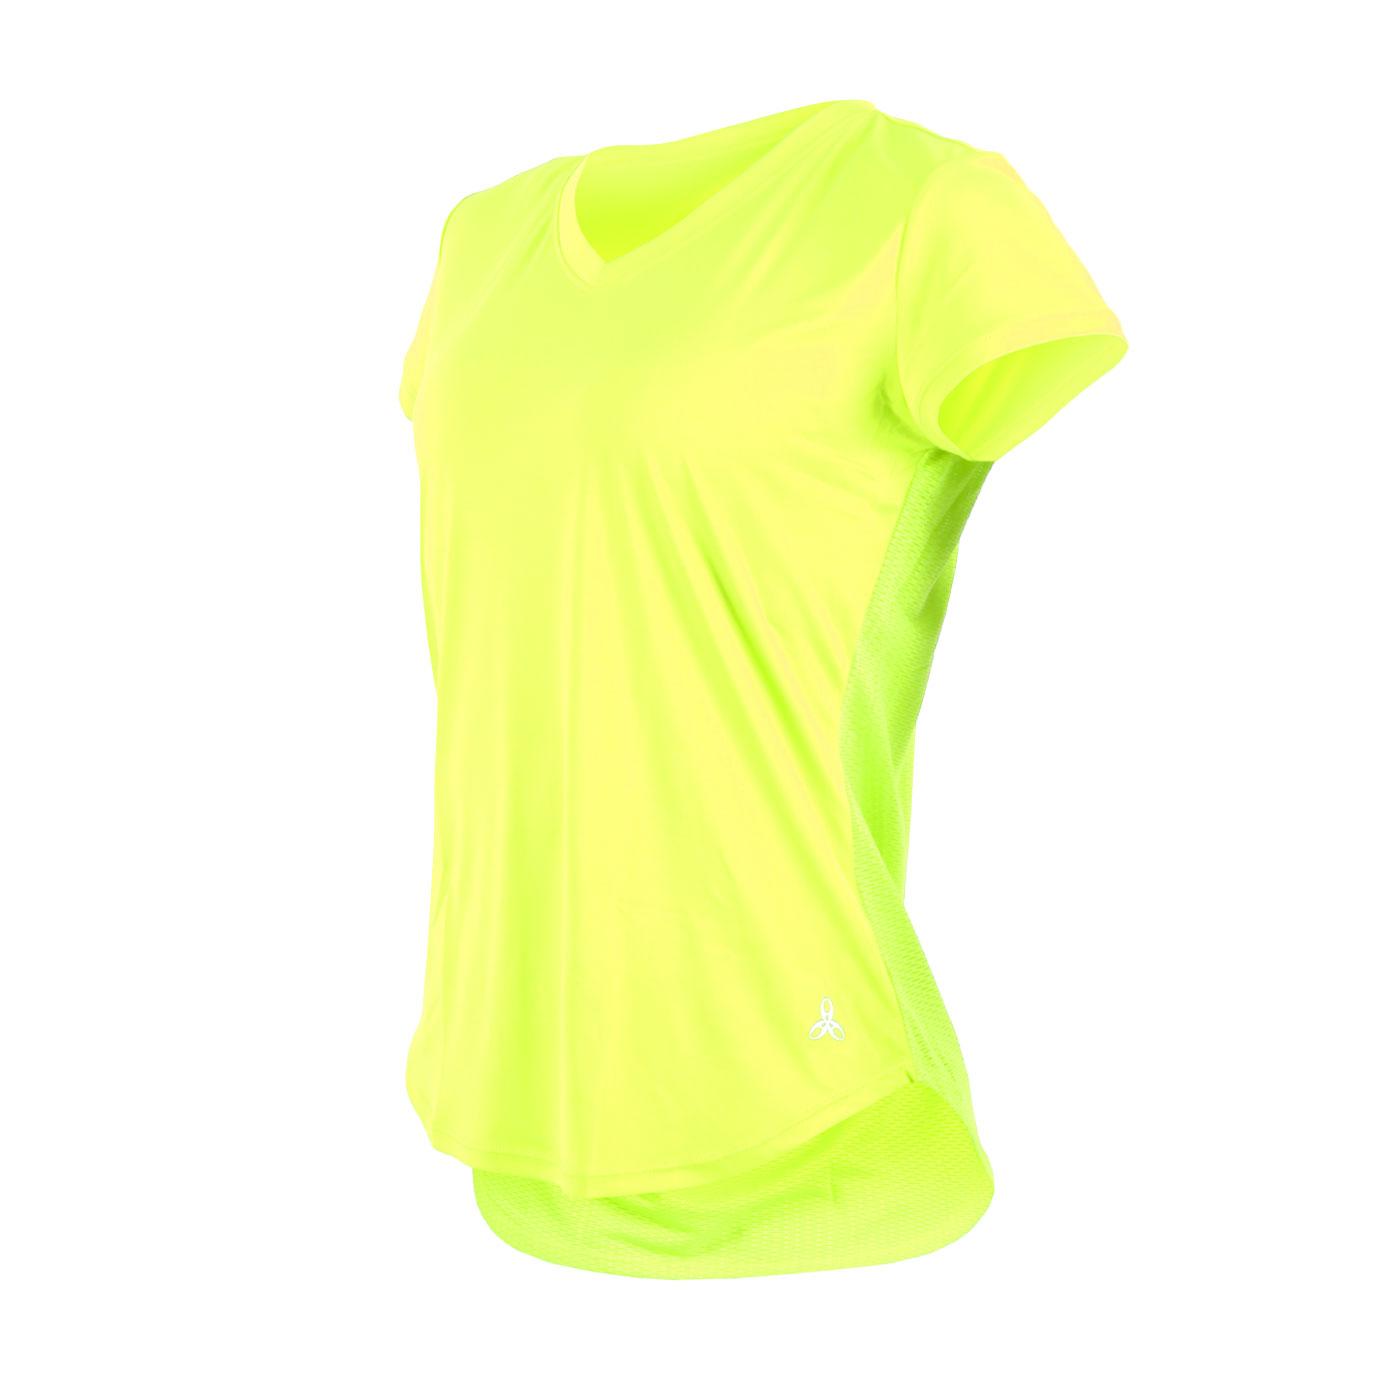 HODARLA 女款繽漾剪接短袖T恤 3136602 - 螢光黃